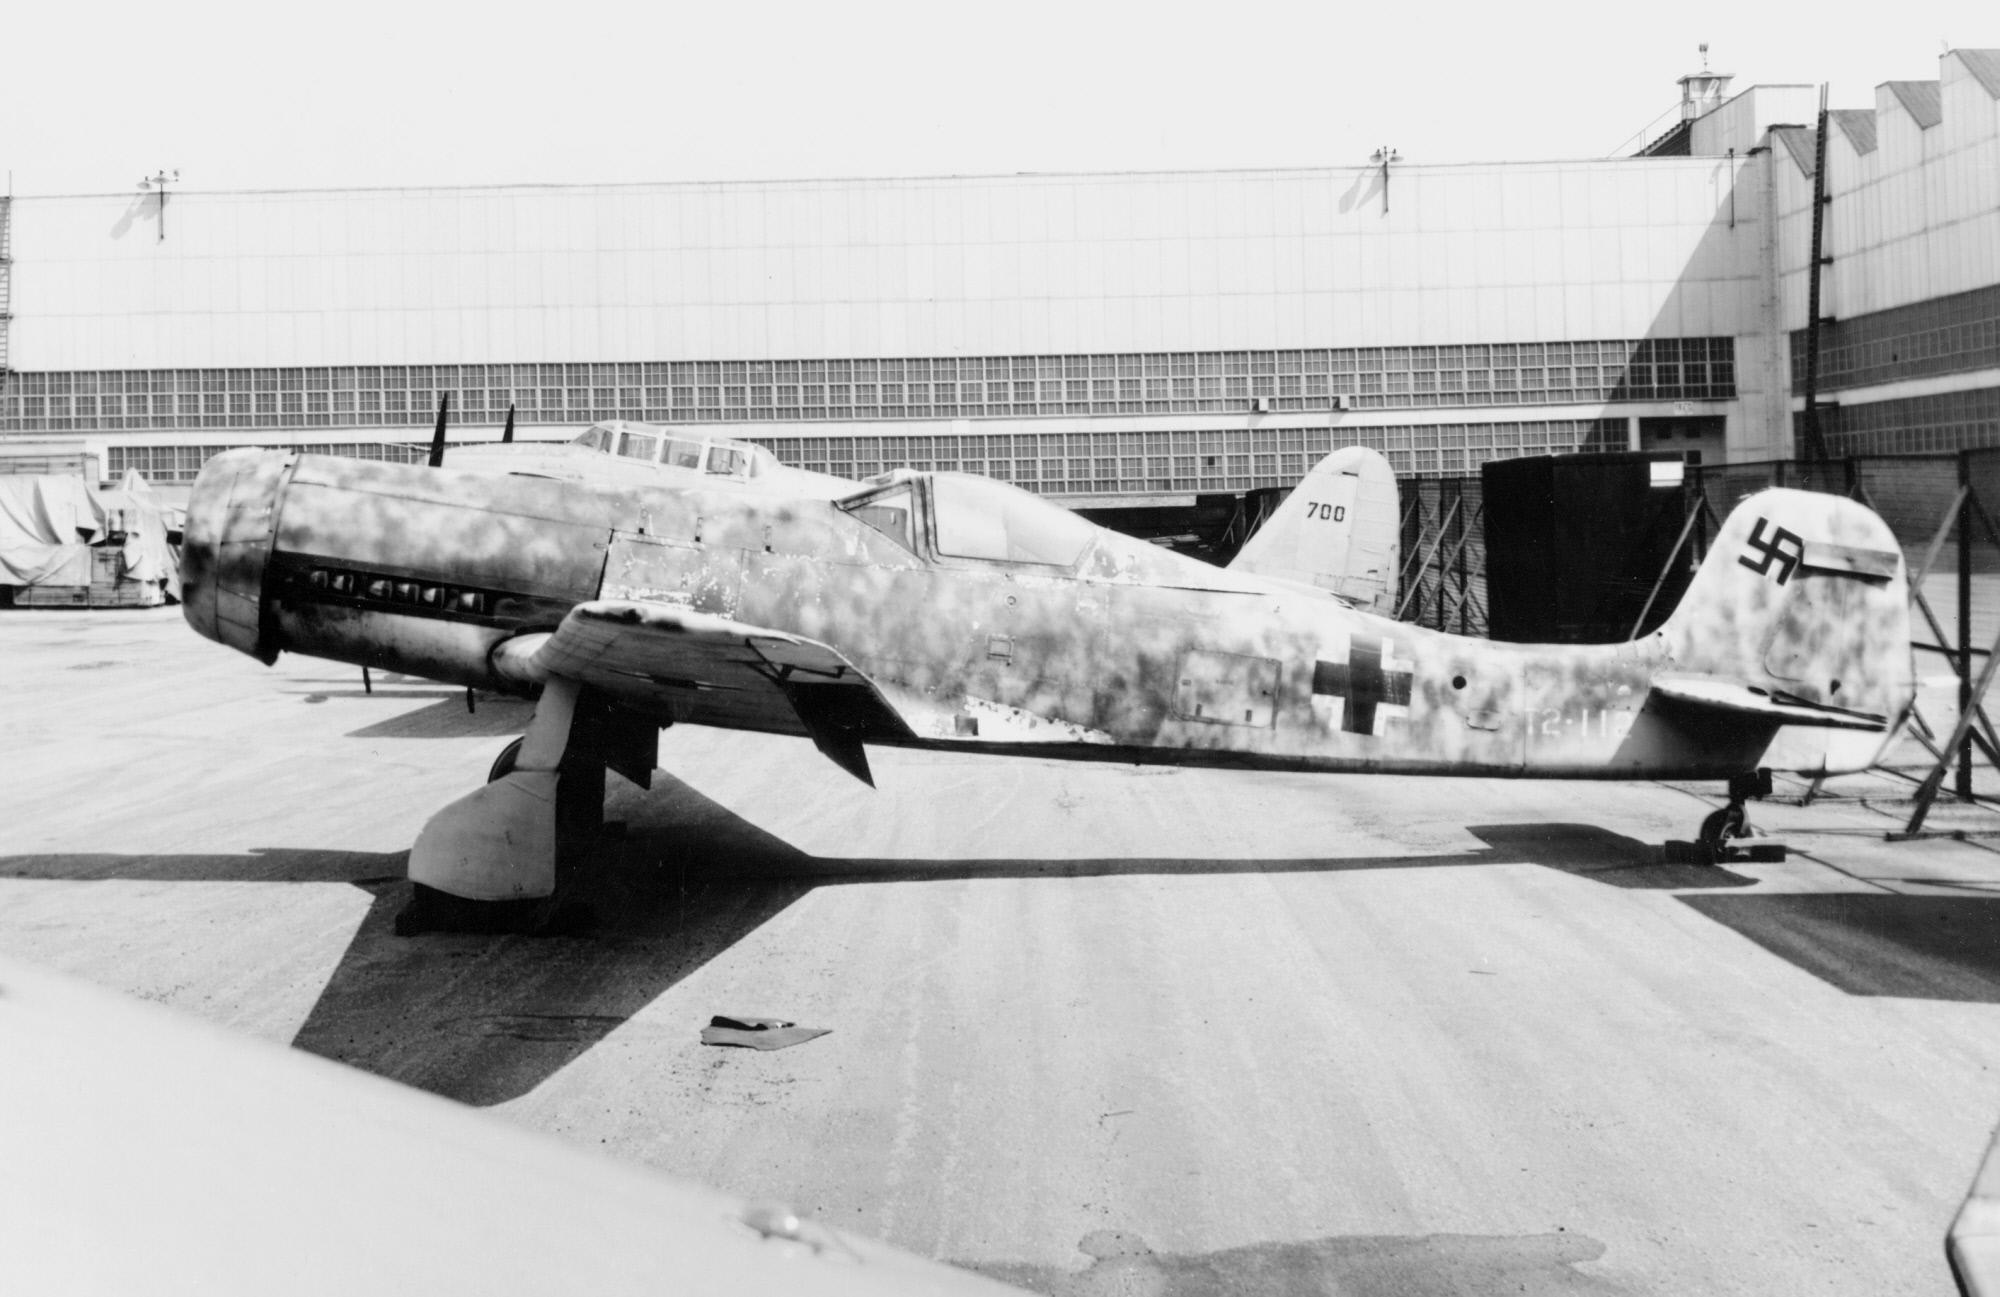 Немецкий истребитель Focke-Wulf Та 152